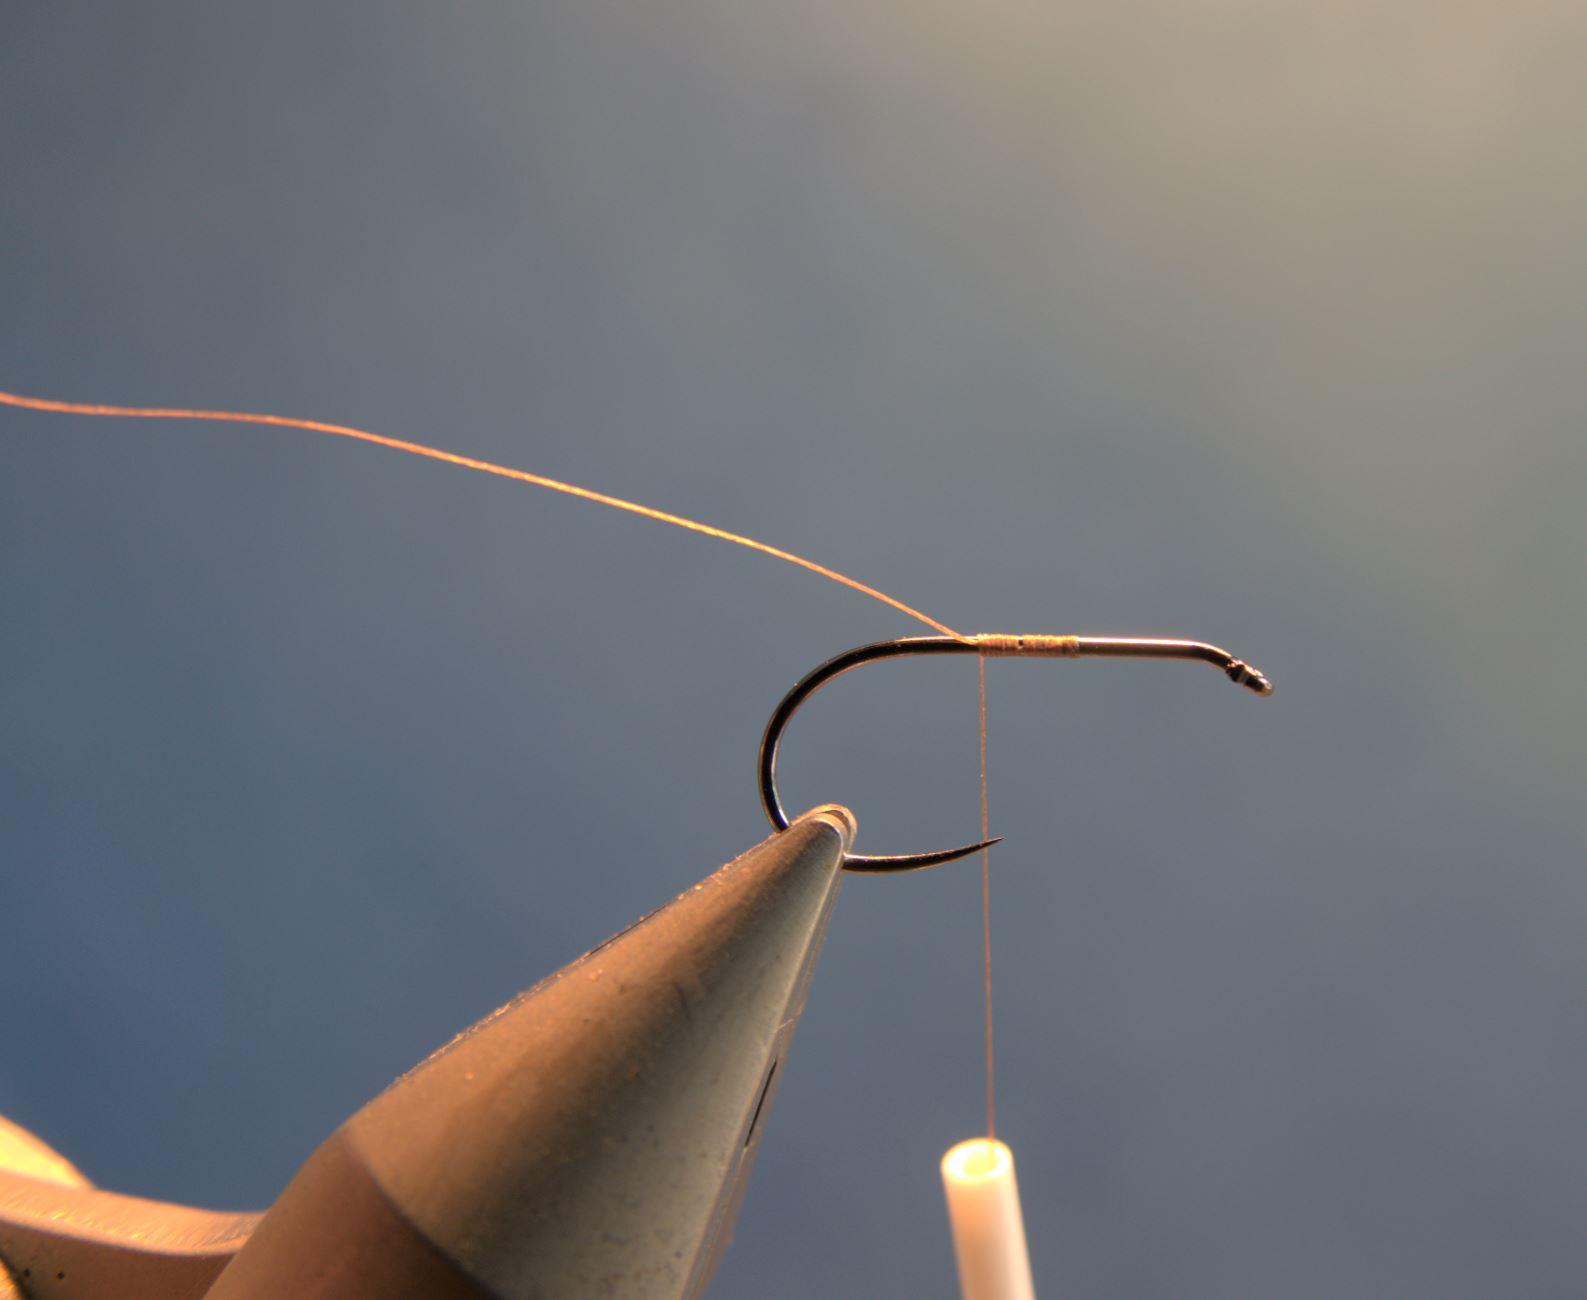 CDC MDM mayfly fly mouche flytying Mai eclosion